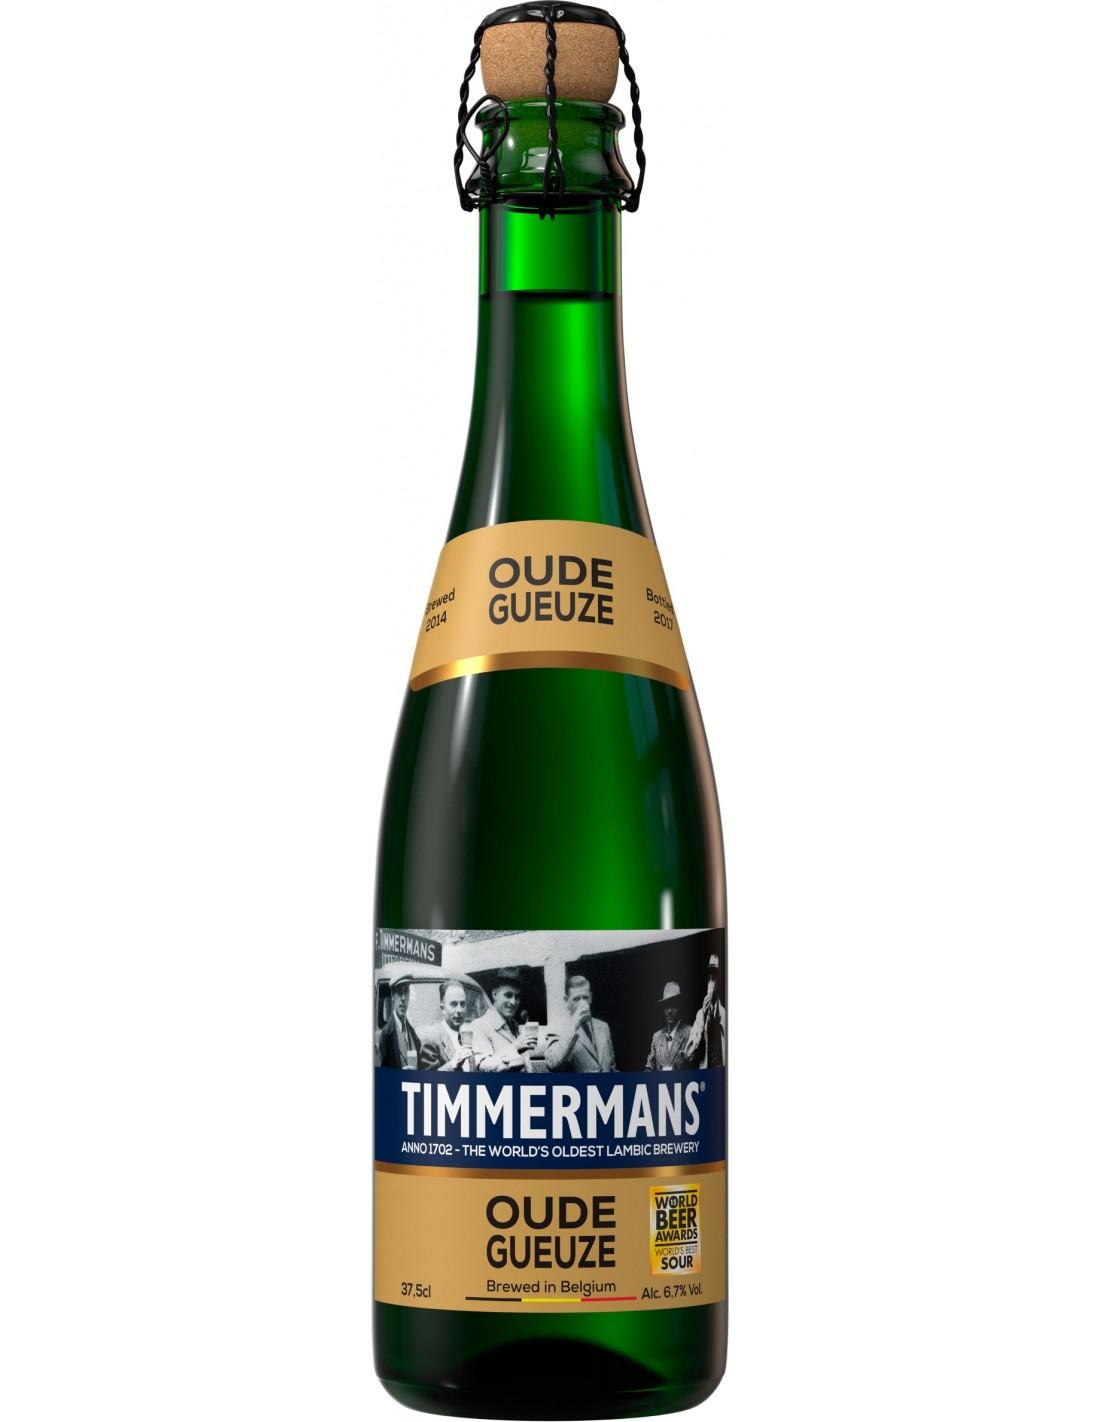 Bere blonda, nefiltrata Timmermans Oude Gueuze, 6.7% alc., 0.37L, Belgia